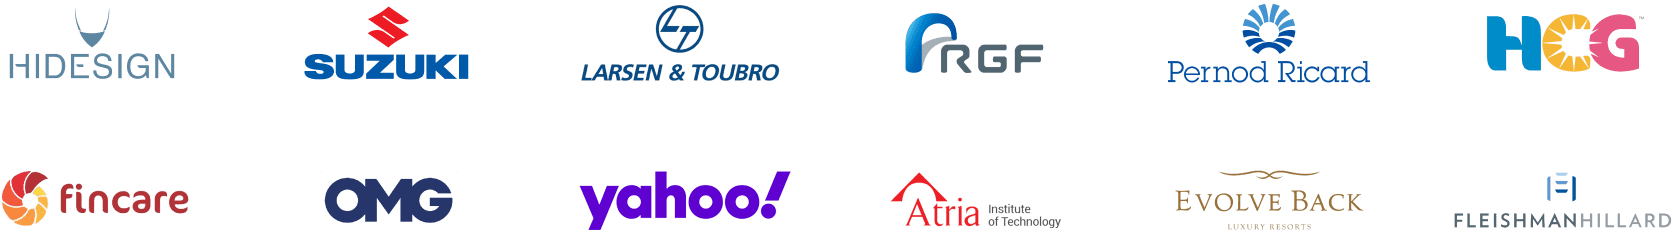 client-logo-sprite